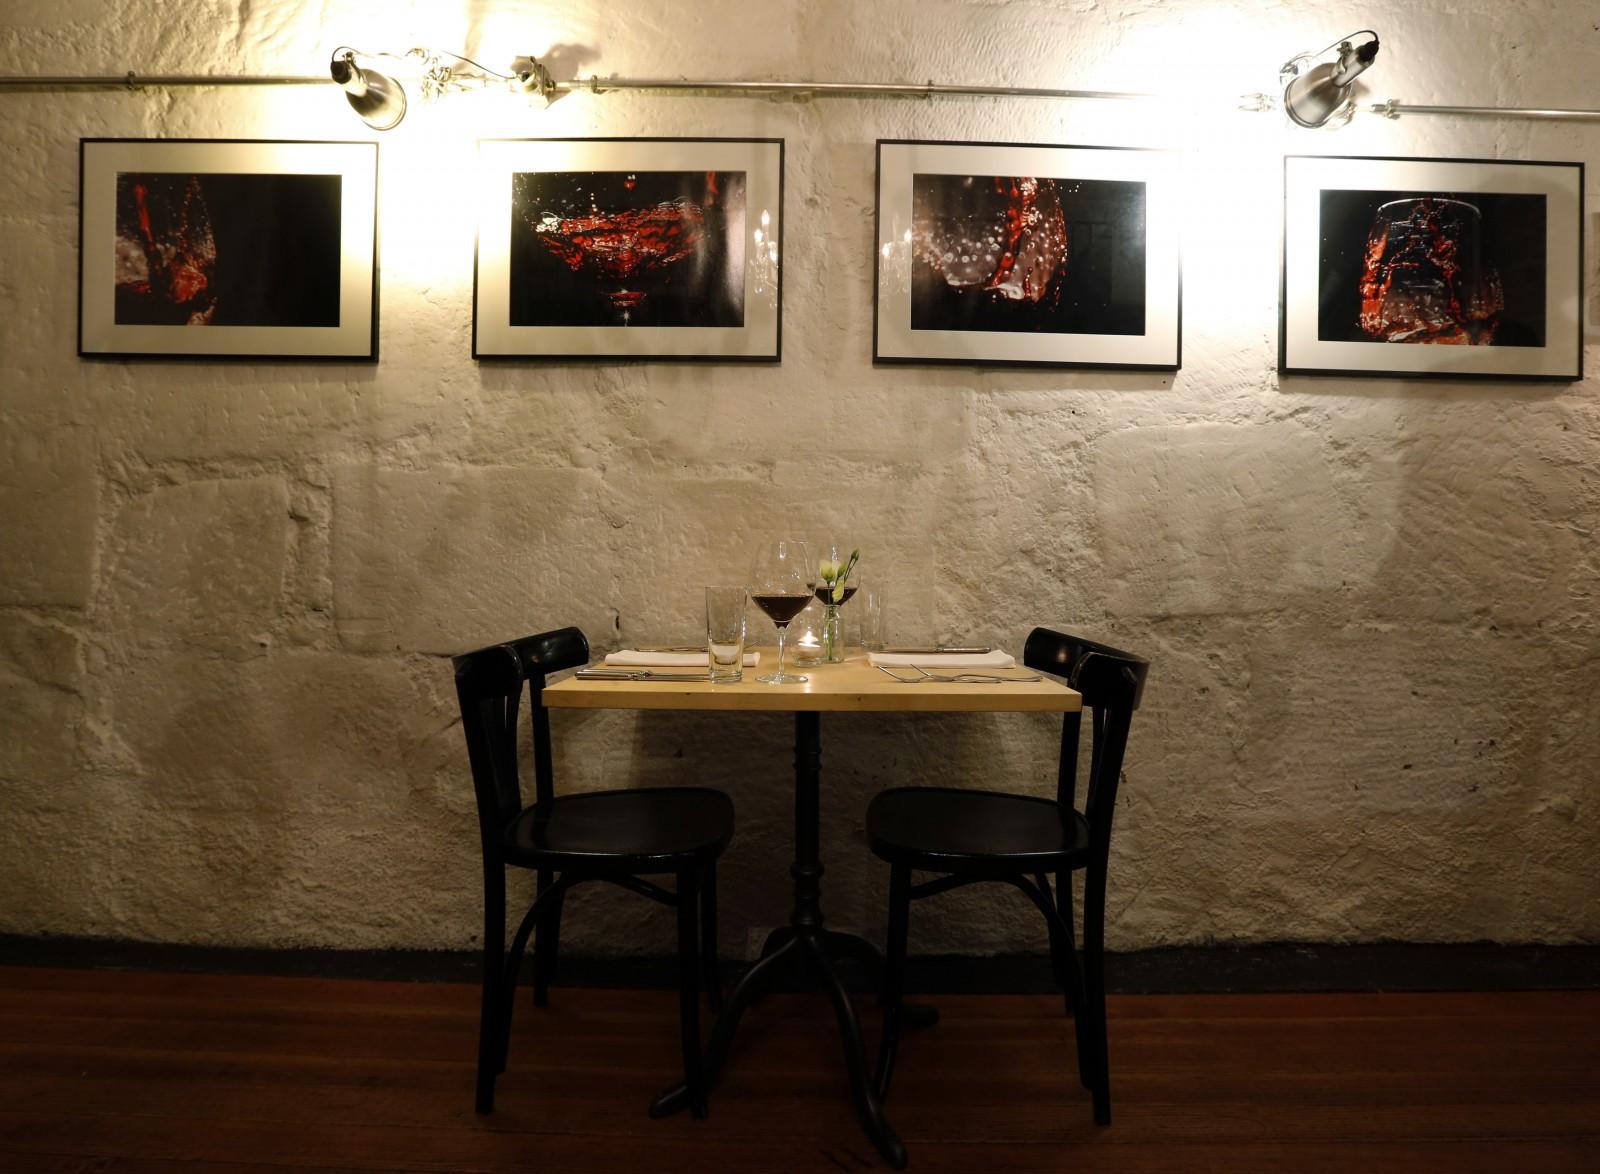 Tredicipercento Restaurant Weinbar in Bern